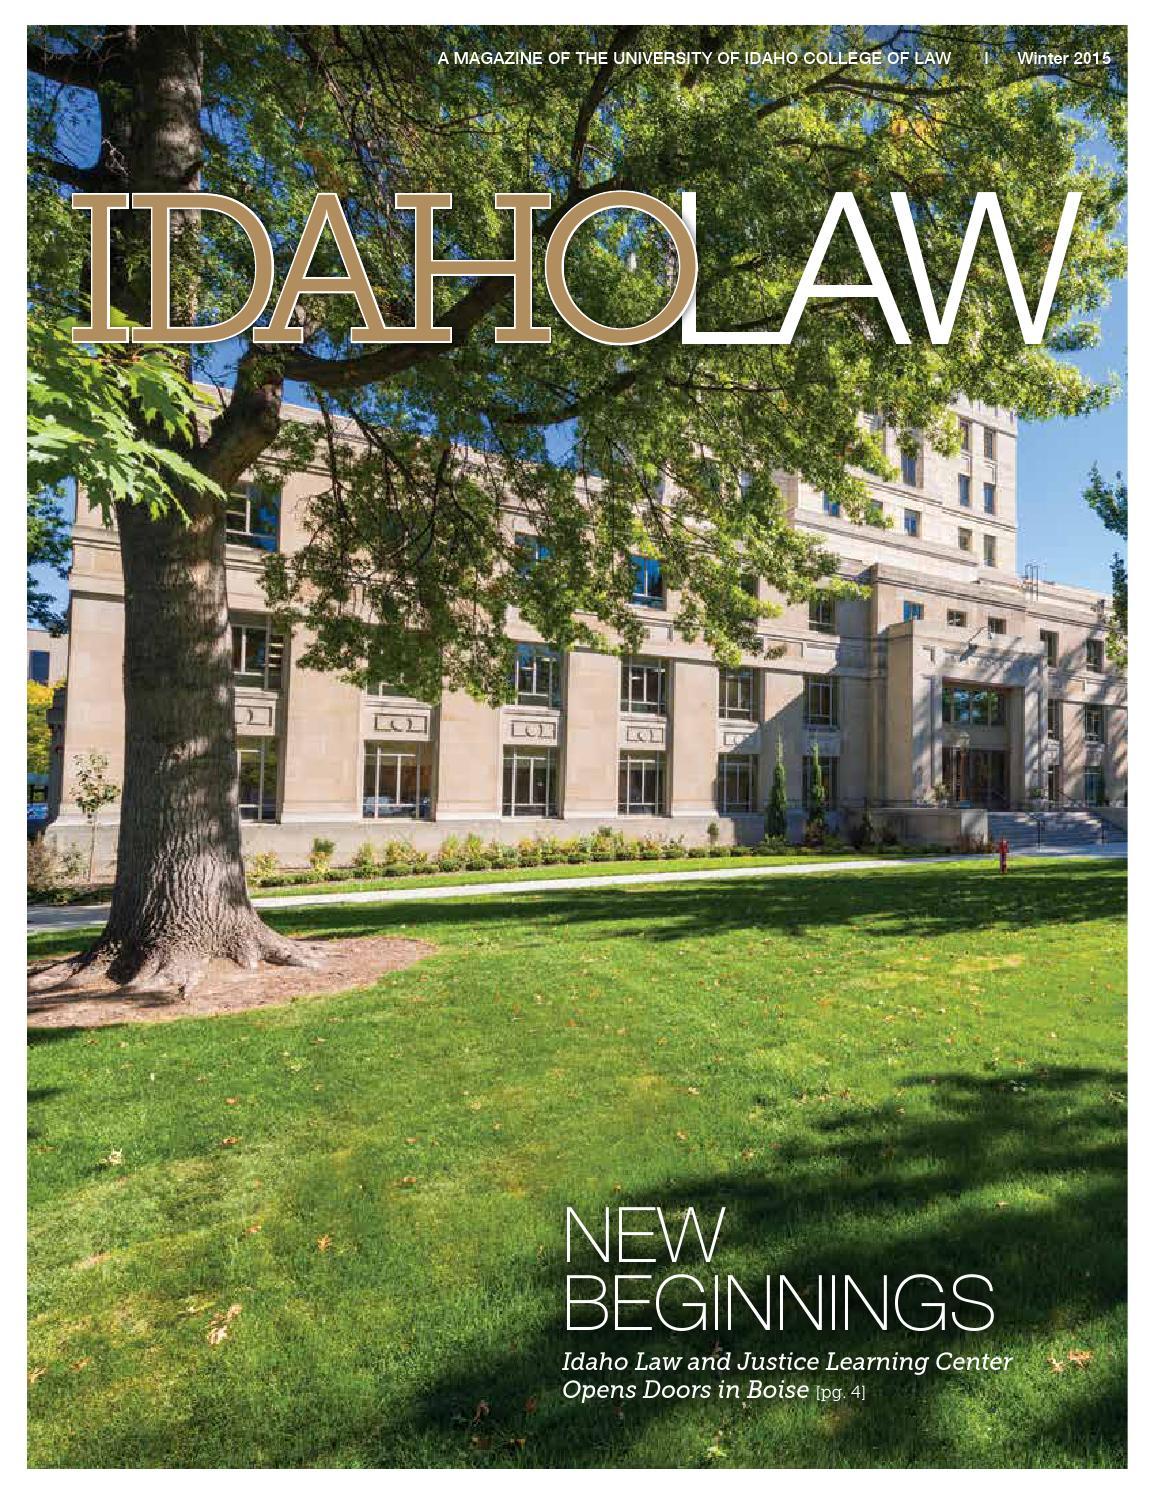 Idaho Law Magazine 2015 by The University of Idaho - issuu